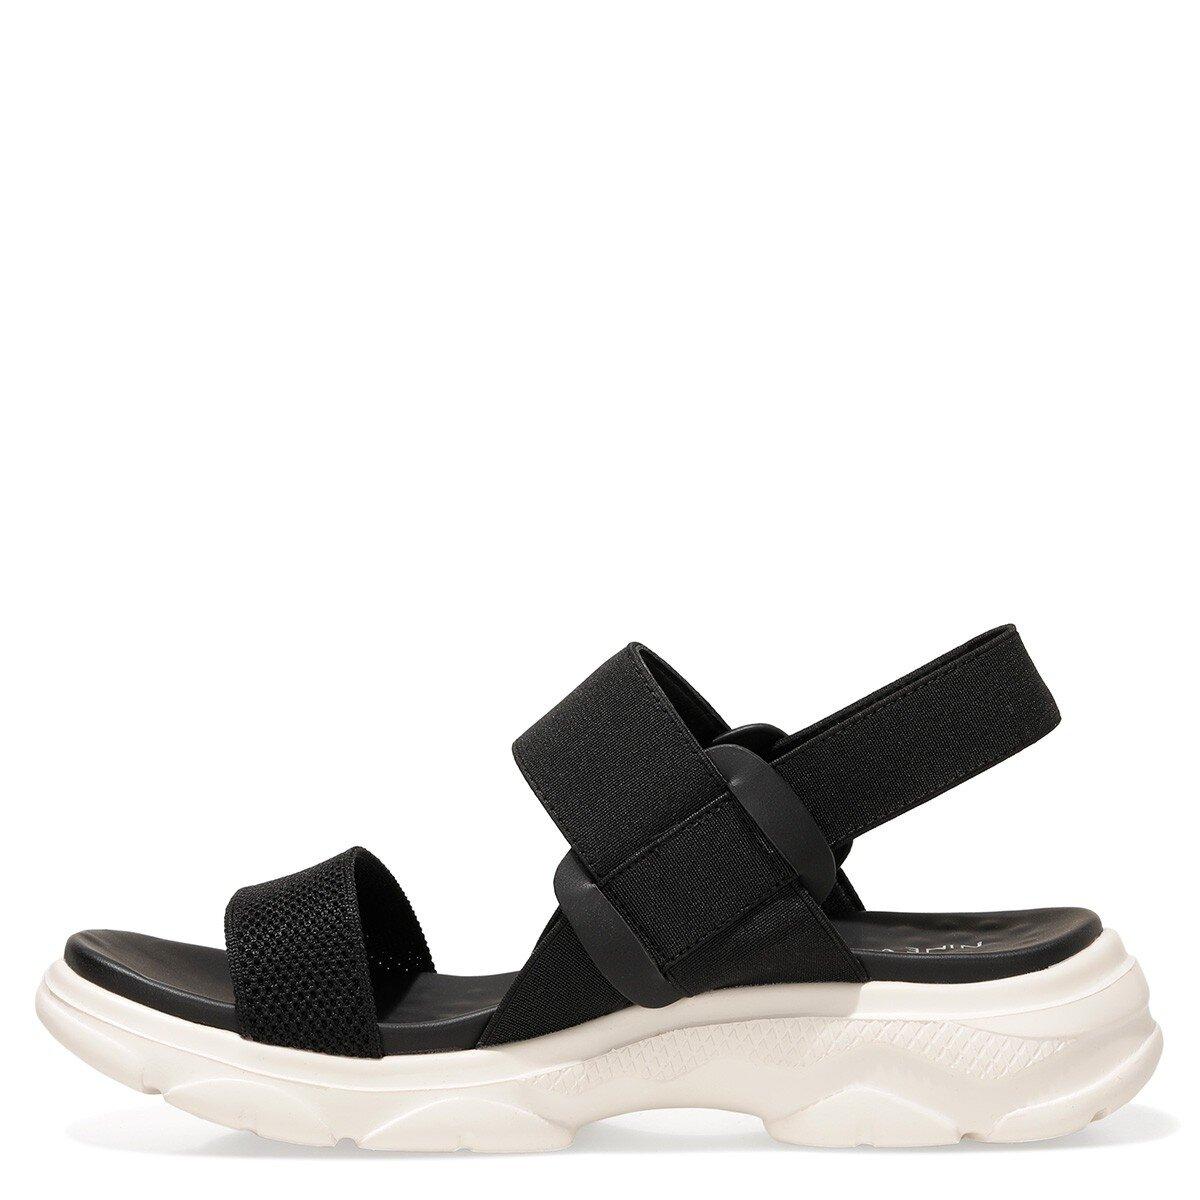 ABAUVIA 1FX Siyah Kadın Sandalet